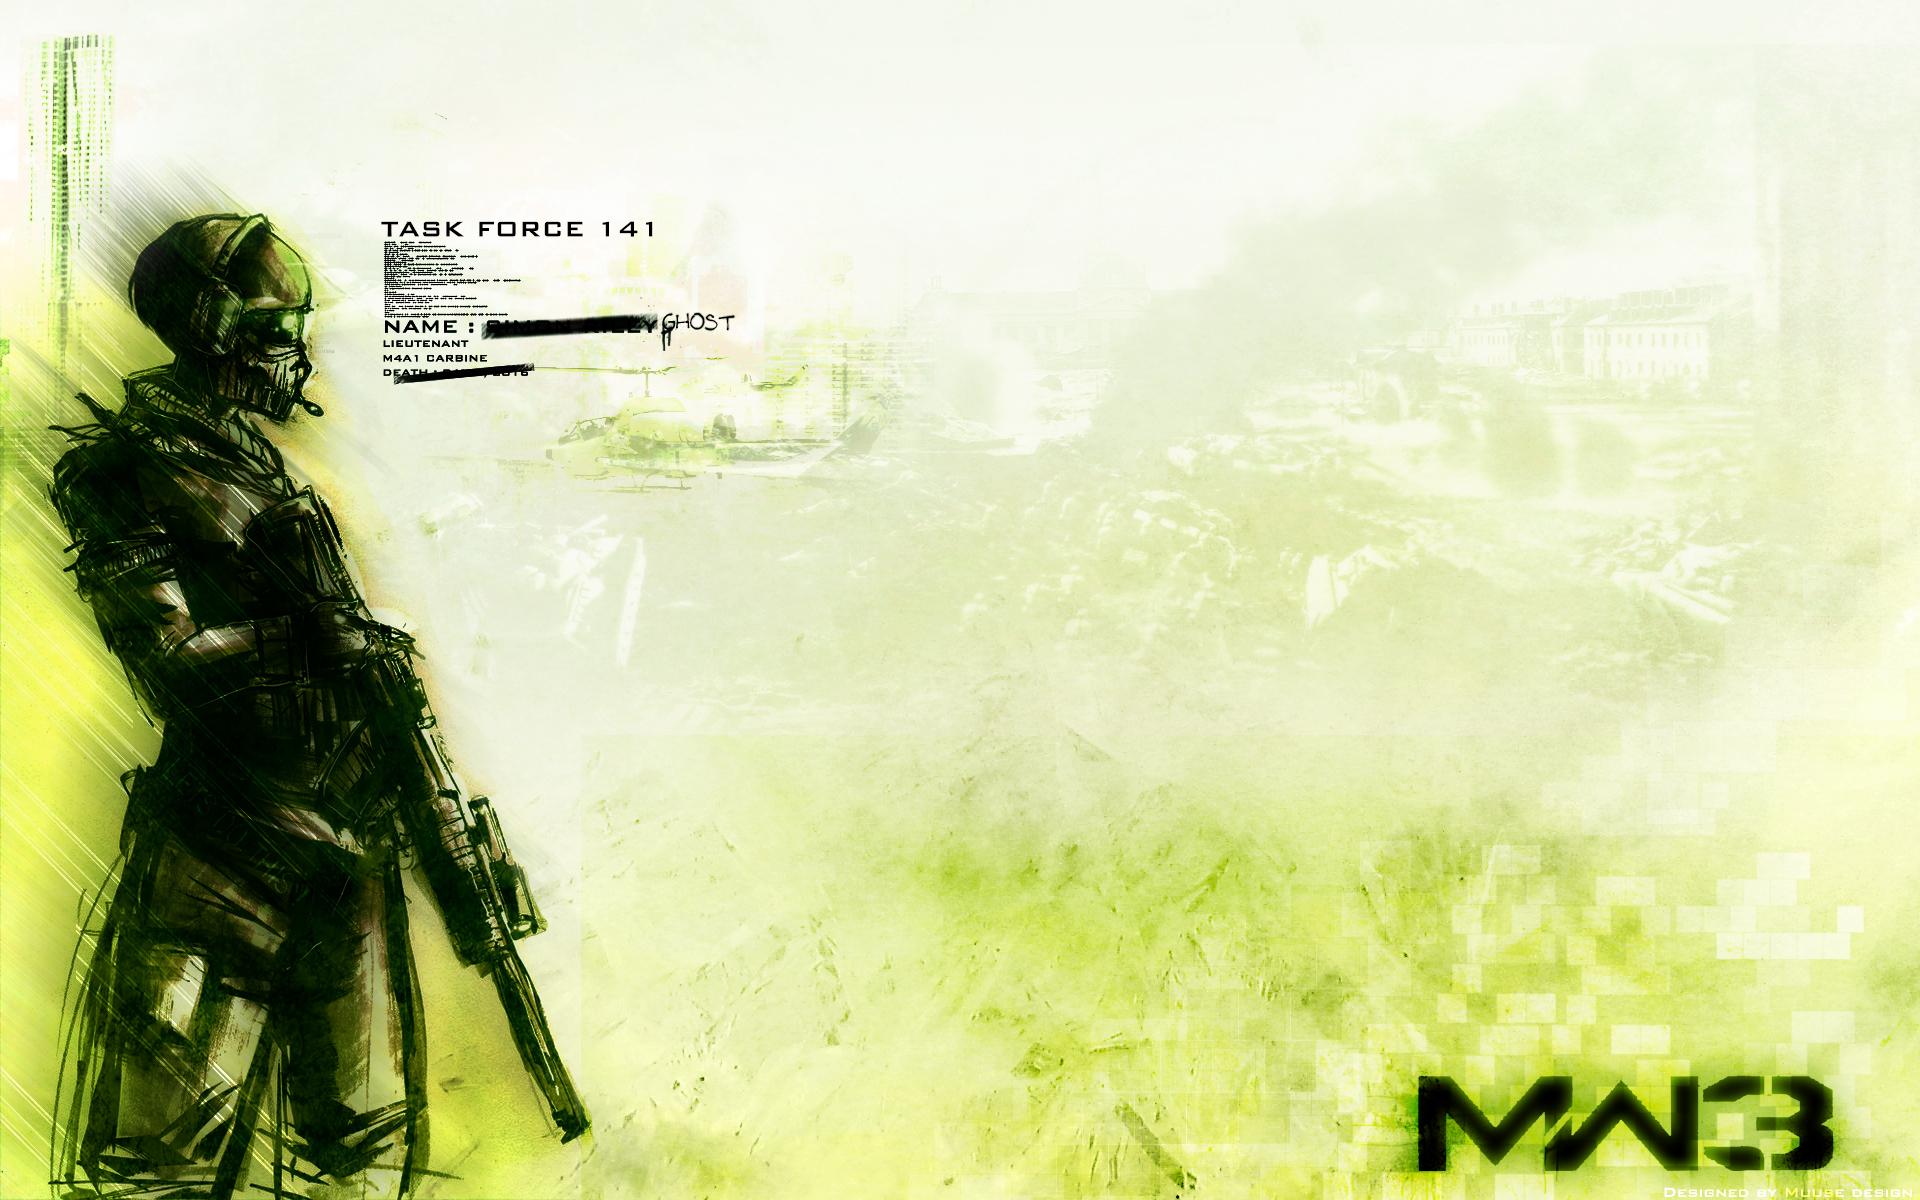 Ghost Return Mw3 Wallpaper By Muusedesign On Deviantart